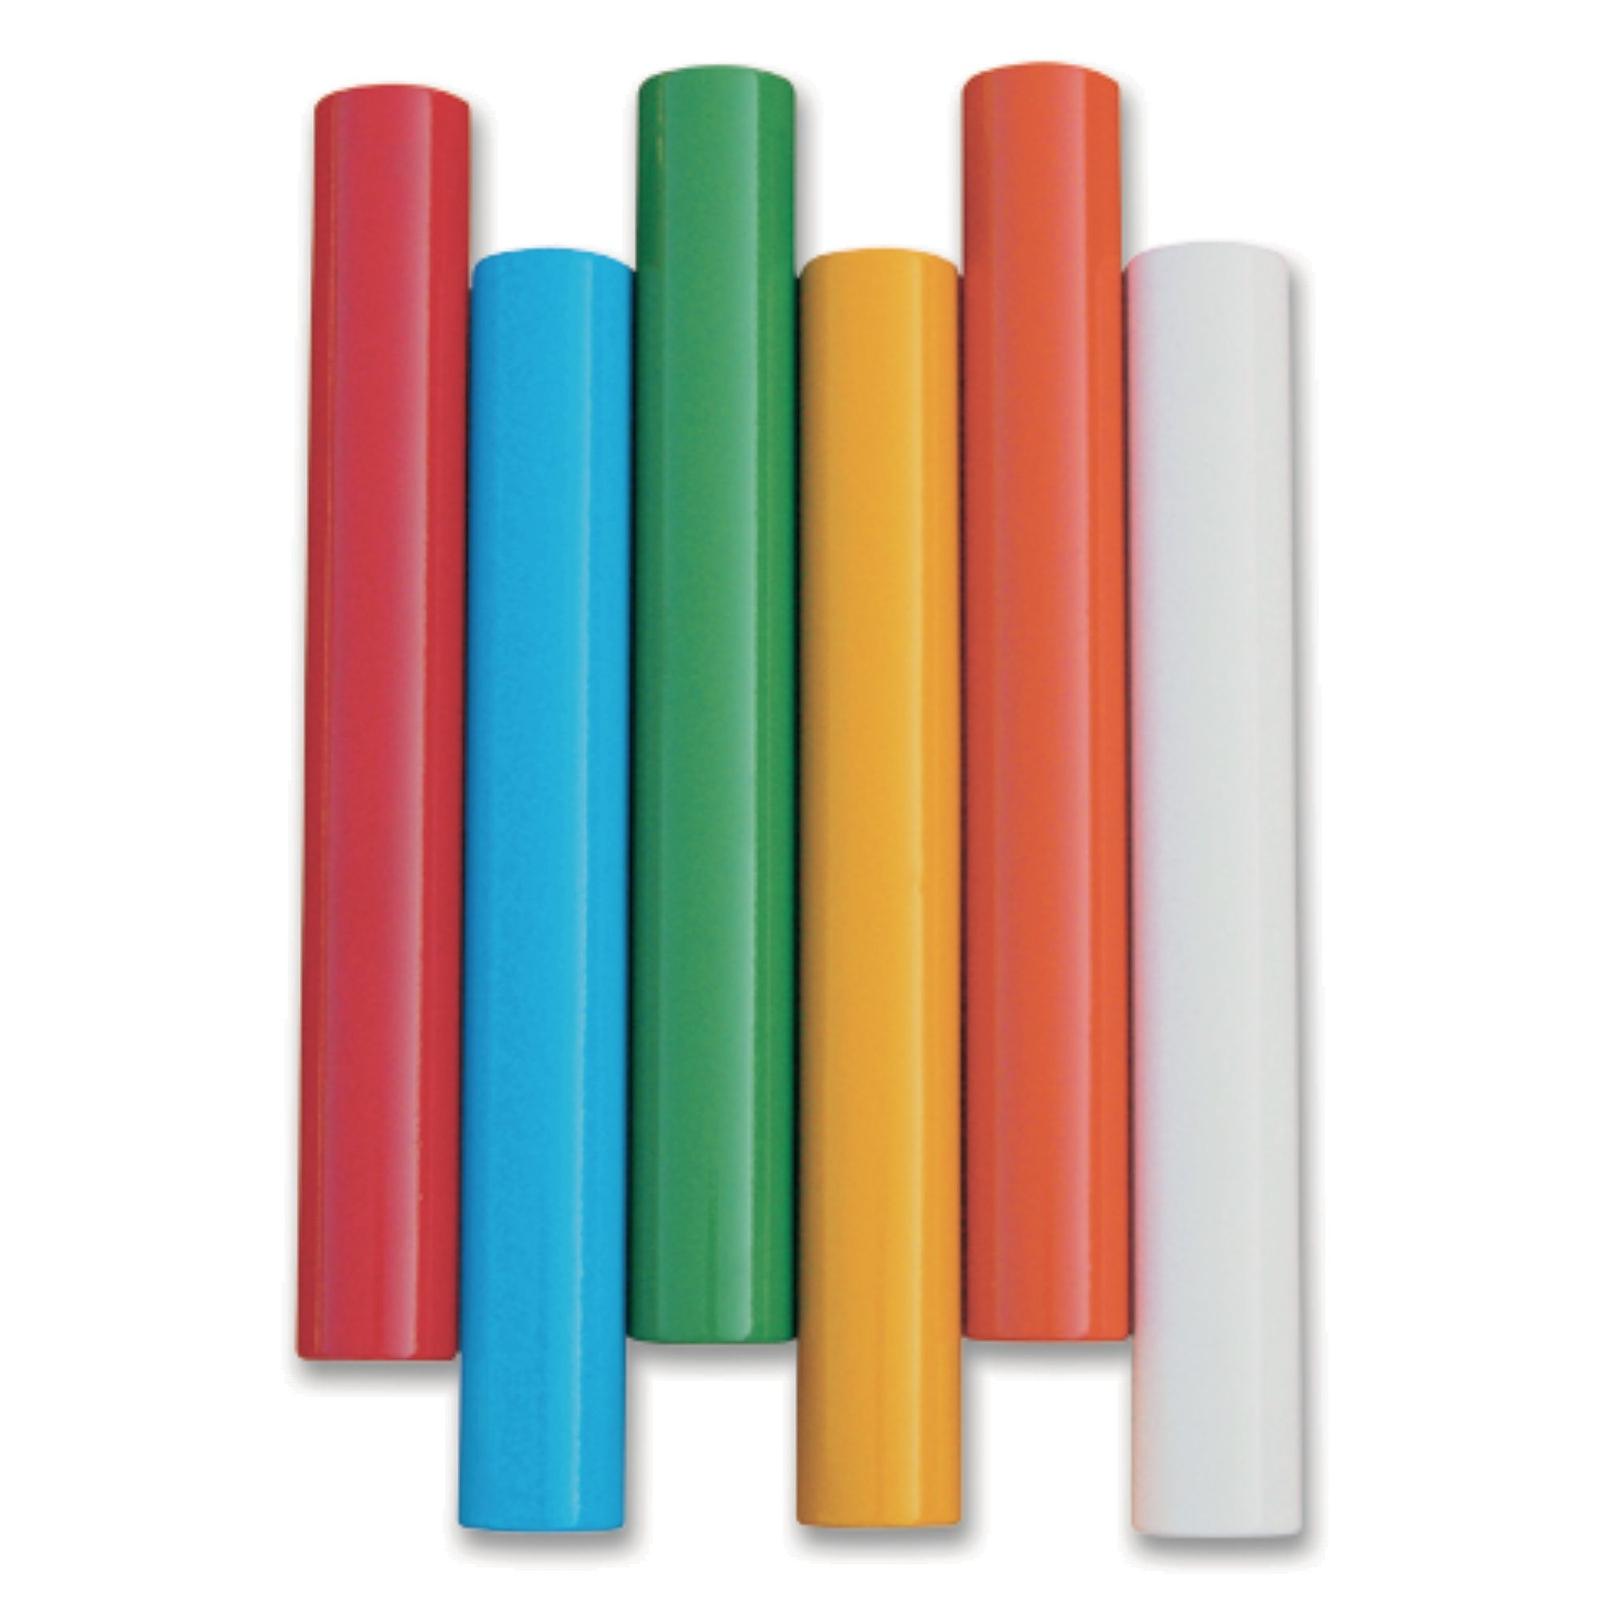 Vinex Junior Aluminium Relay Batons, Pack of 6 - 32mm